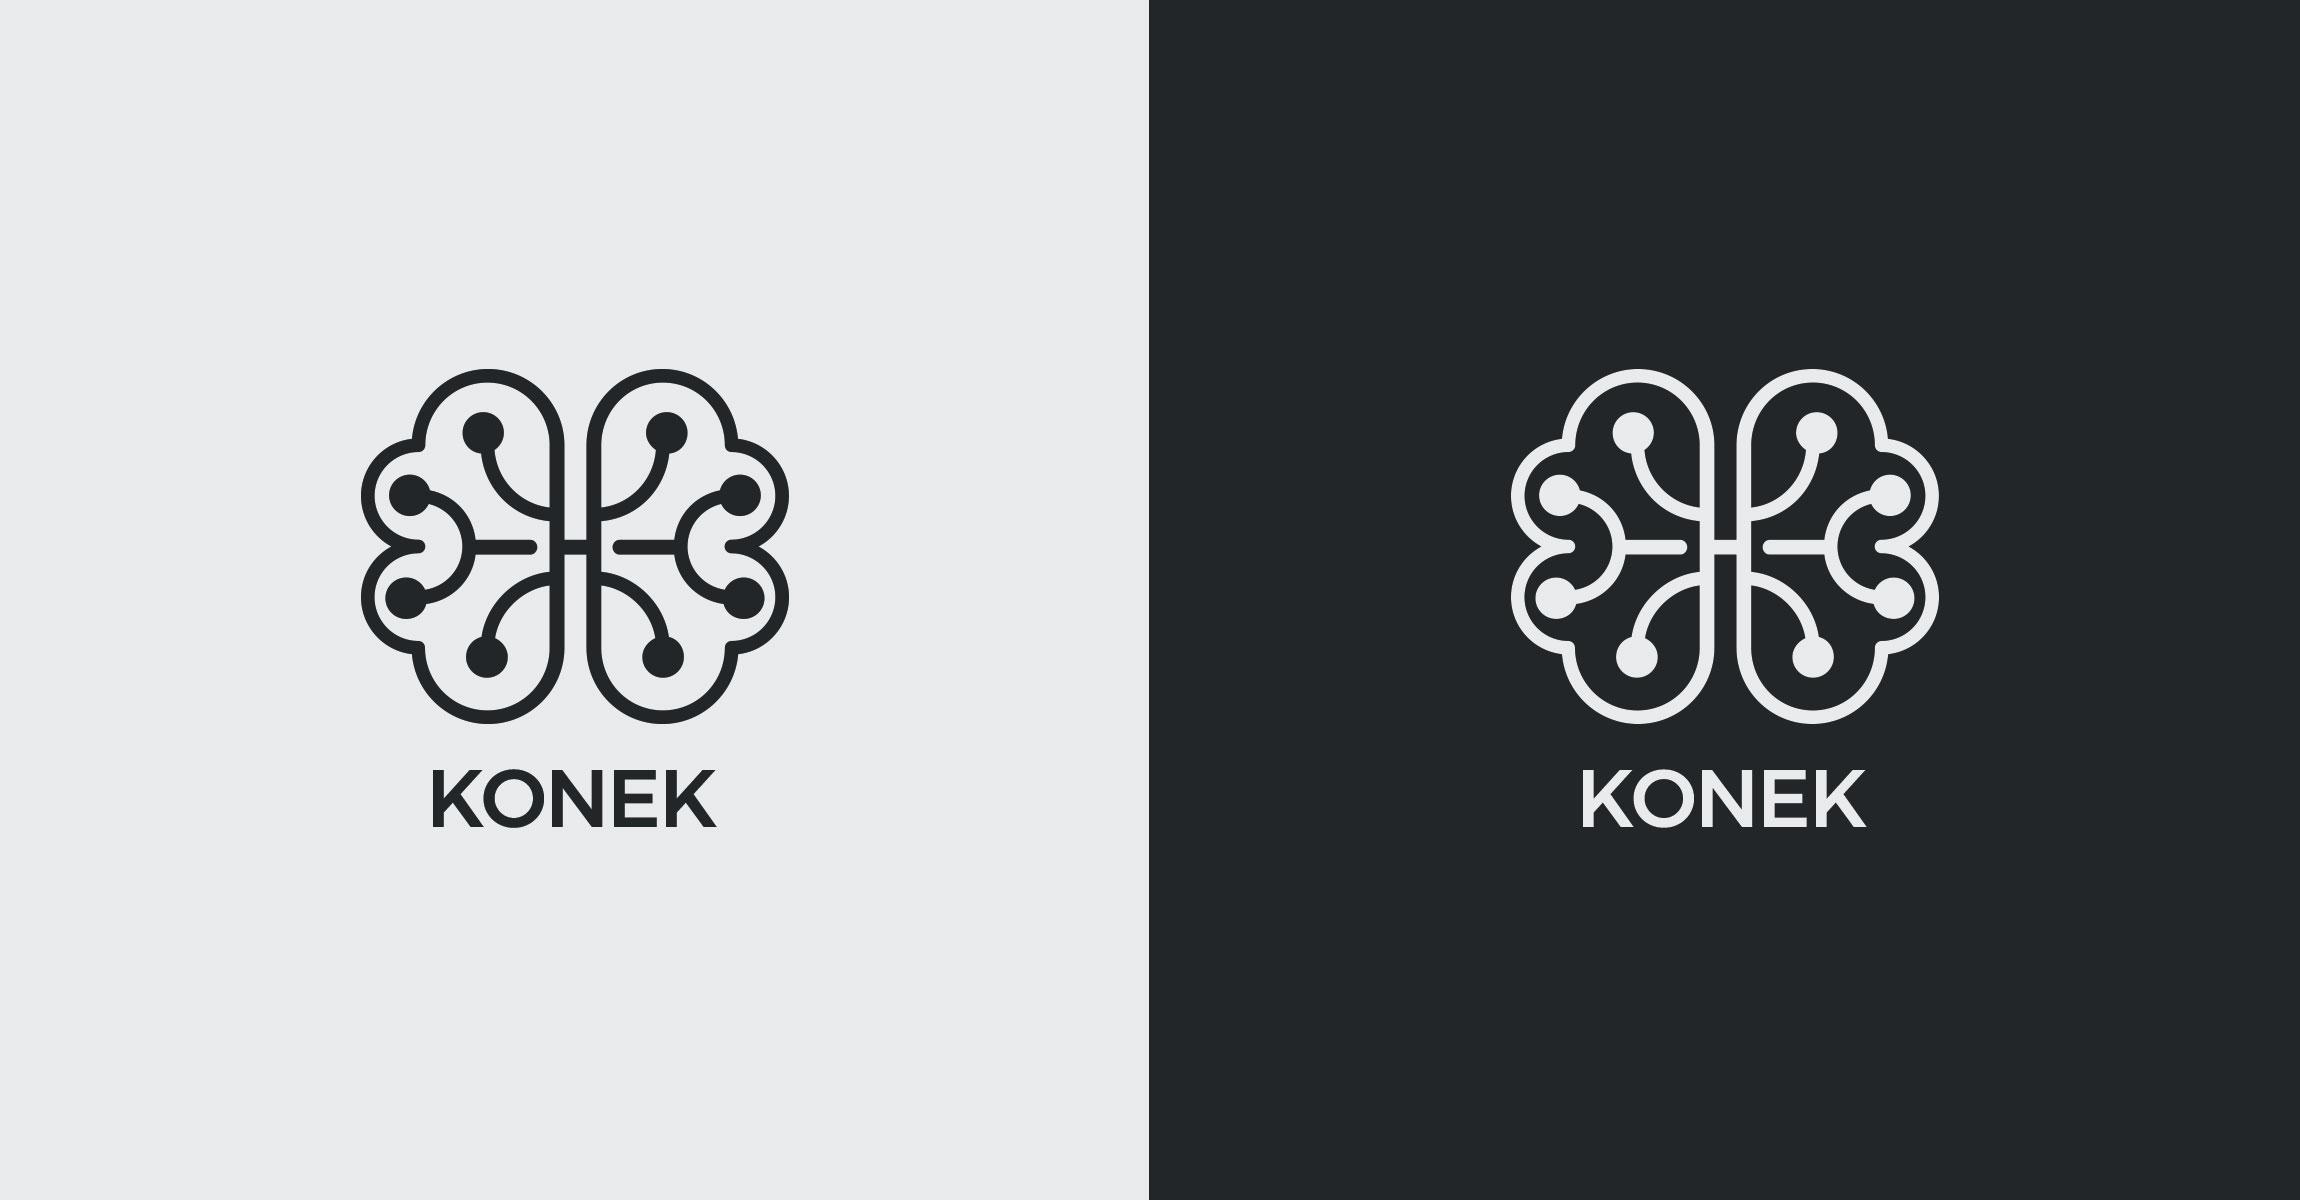 konek-black-and-white